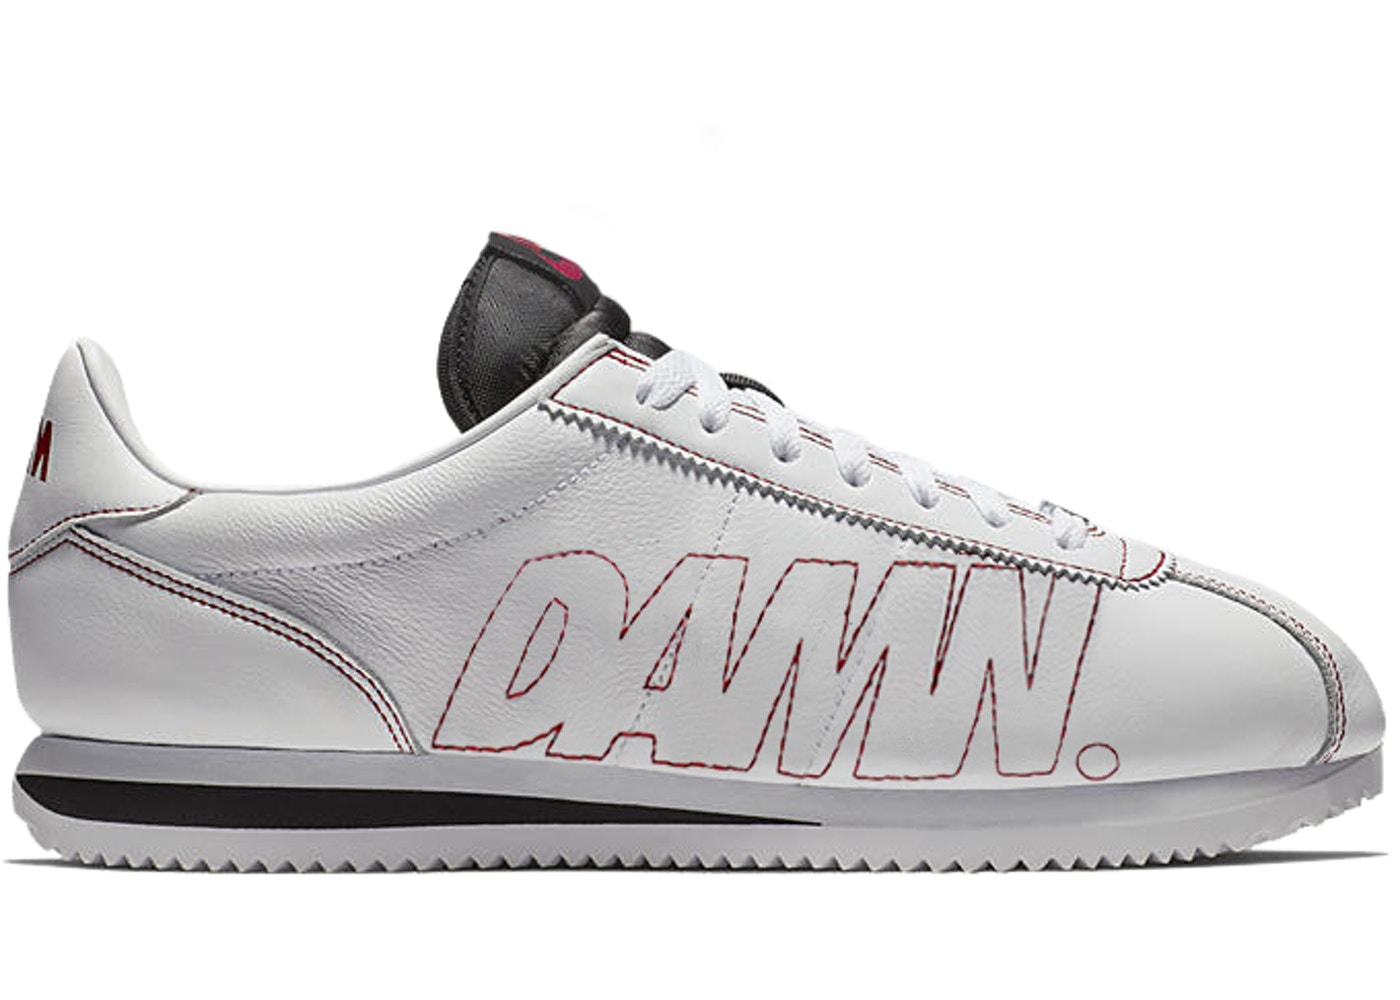 cavar Entrada Histérico  Nike Cortez Kenny 1 Kendrick Lamar Damn White Gym Red - AV8255-106